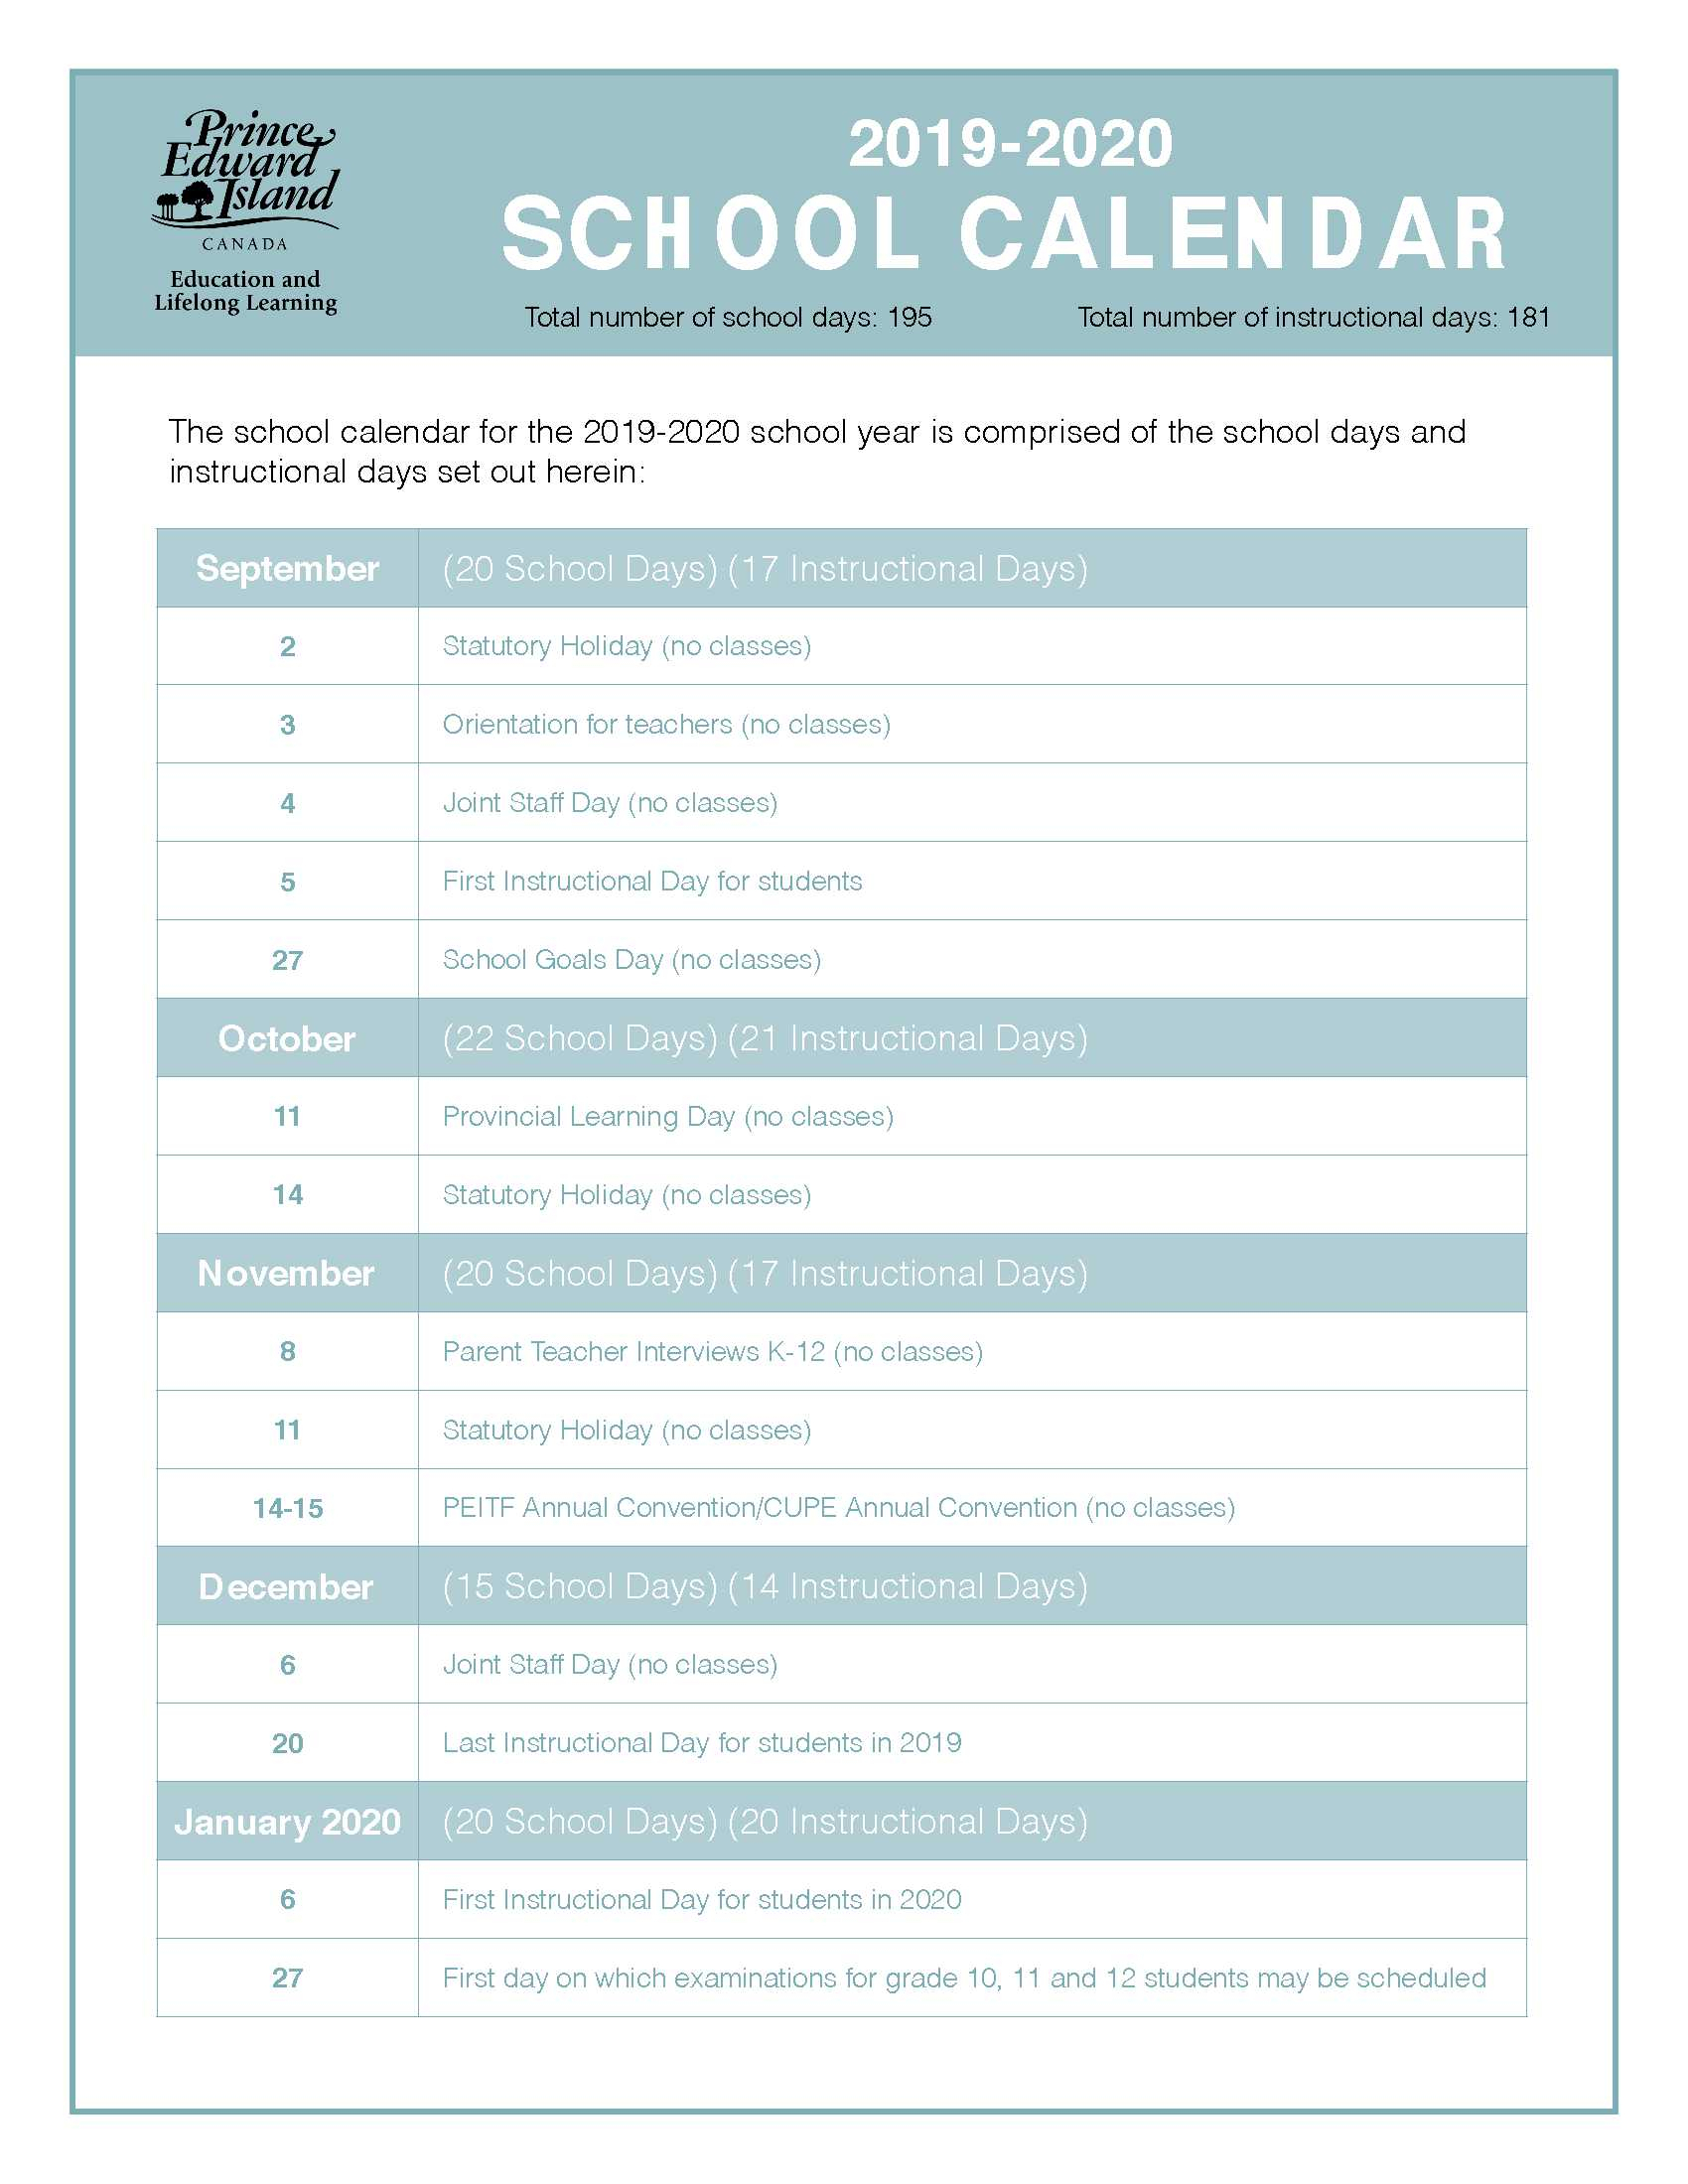 20192020 School Calendar | East Wiltshire Intermediate School with regard to 2020 And 2020 Pei School Calendar